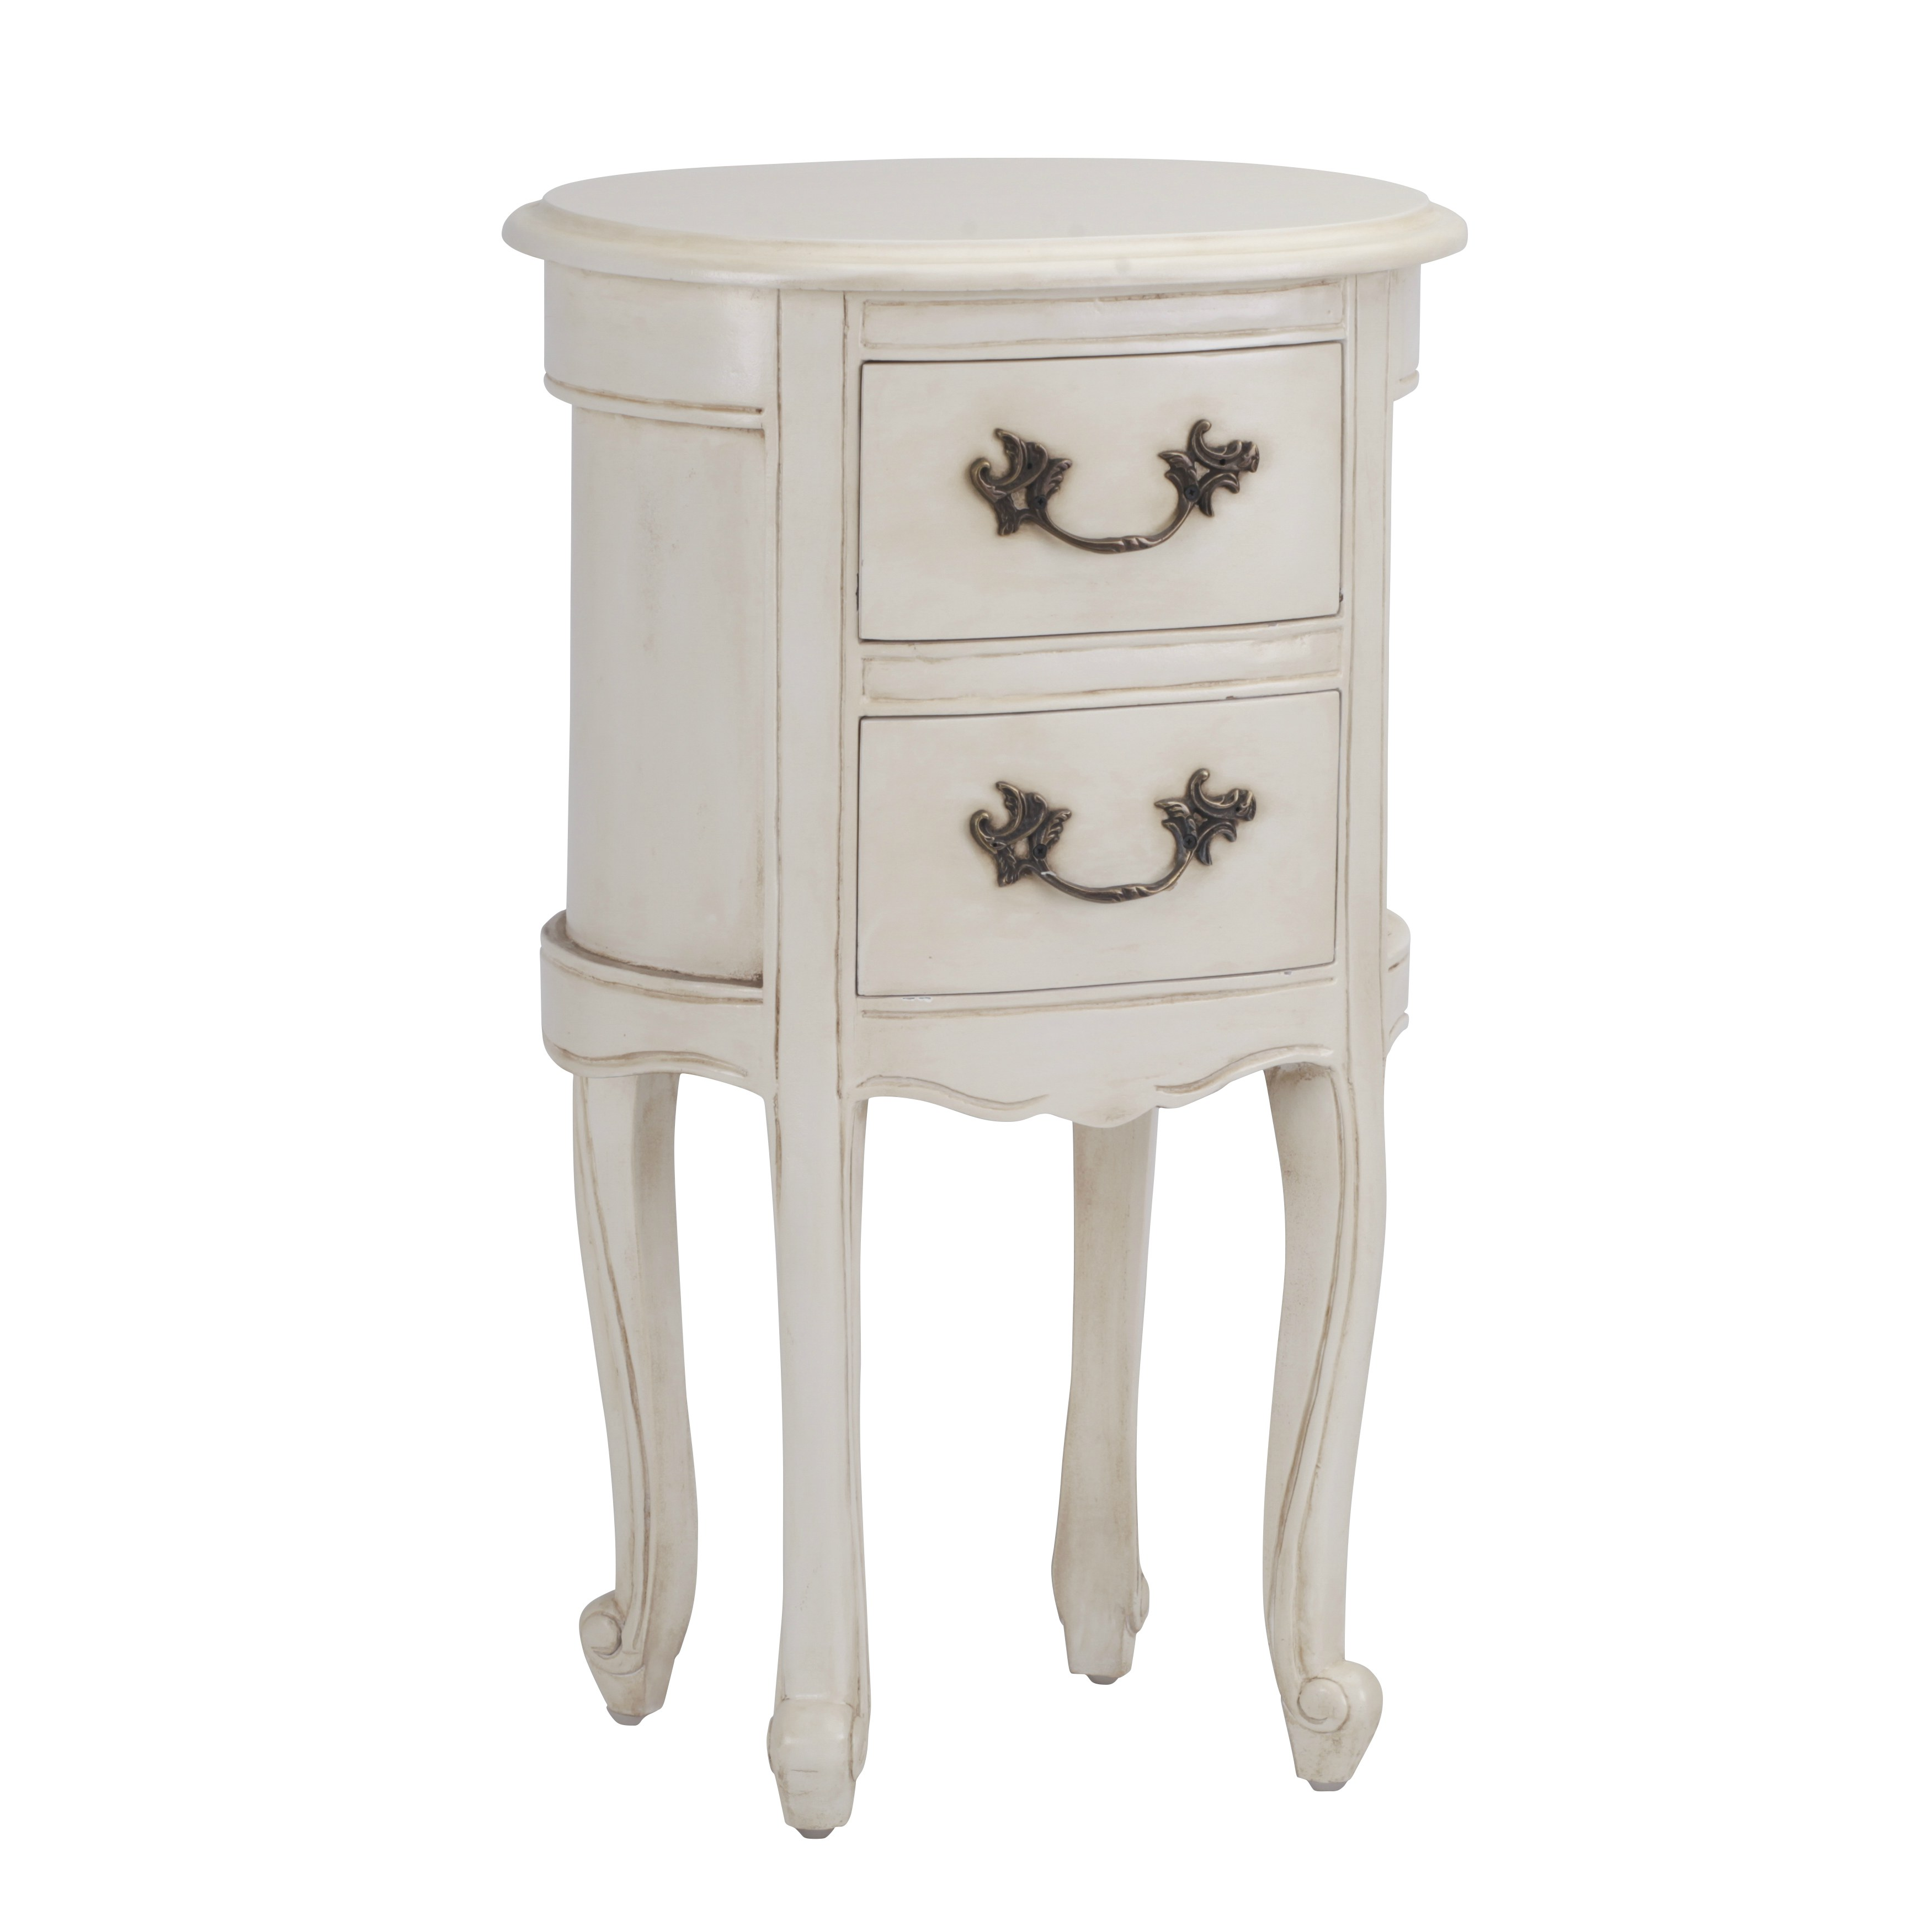 Aged Ivory Oval Bedside